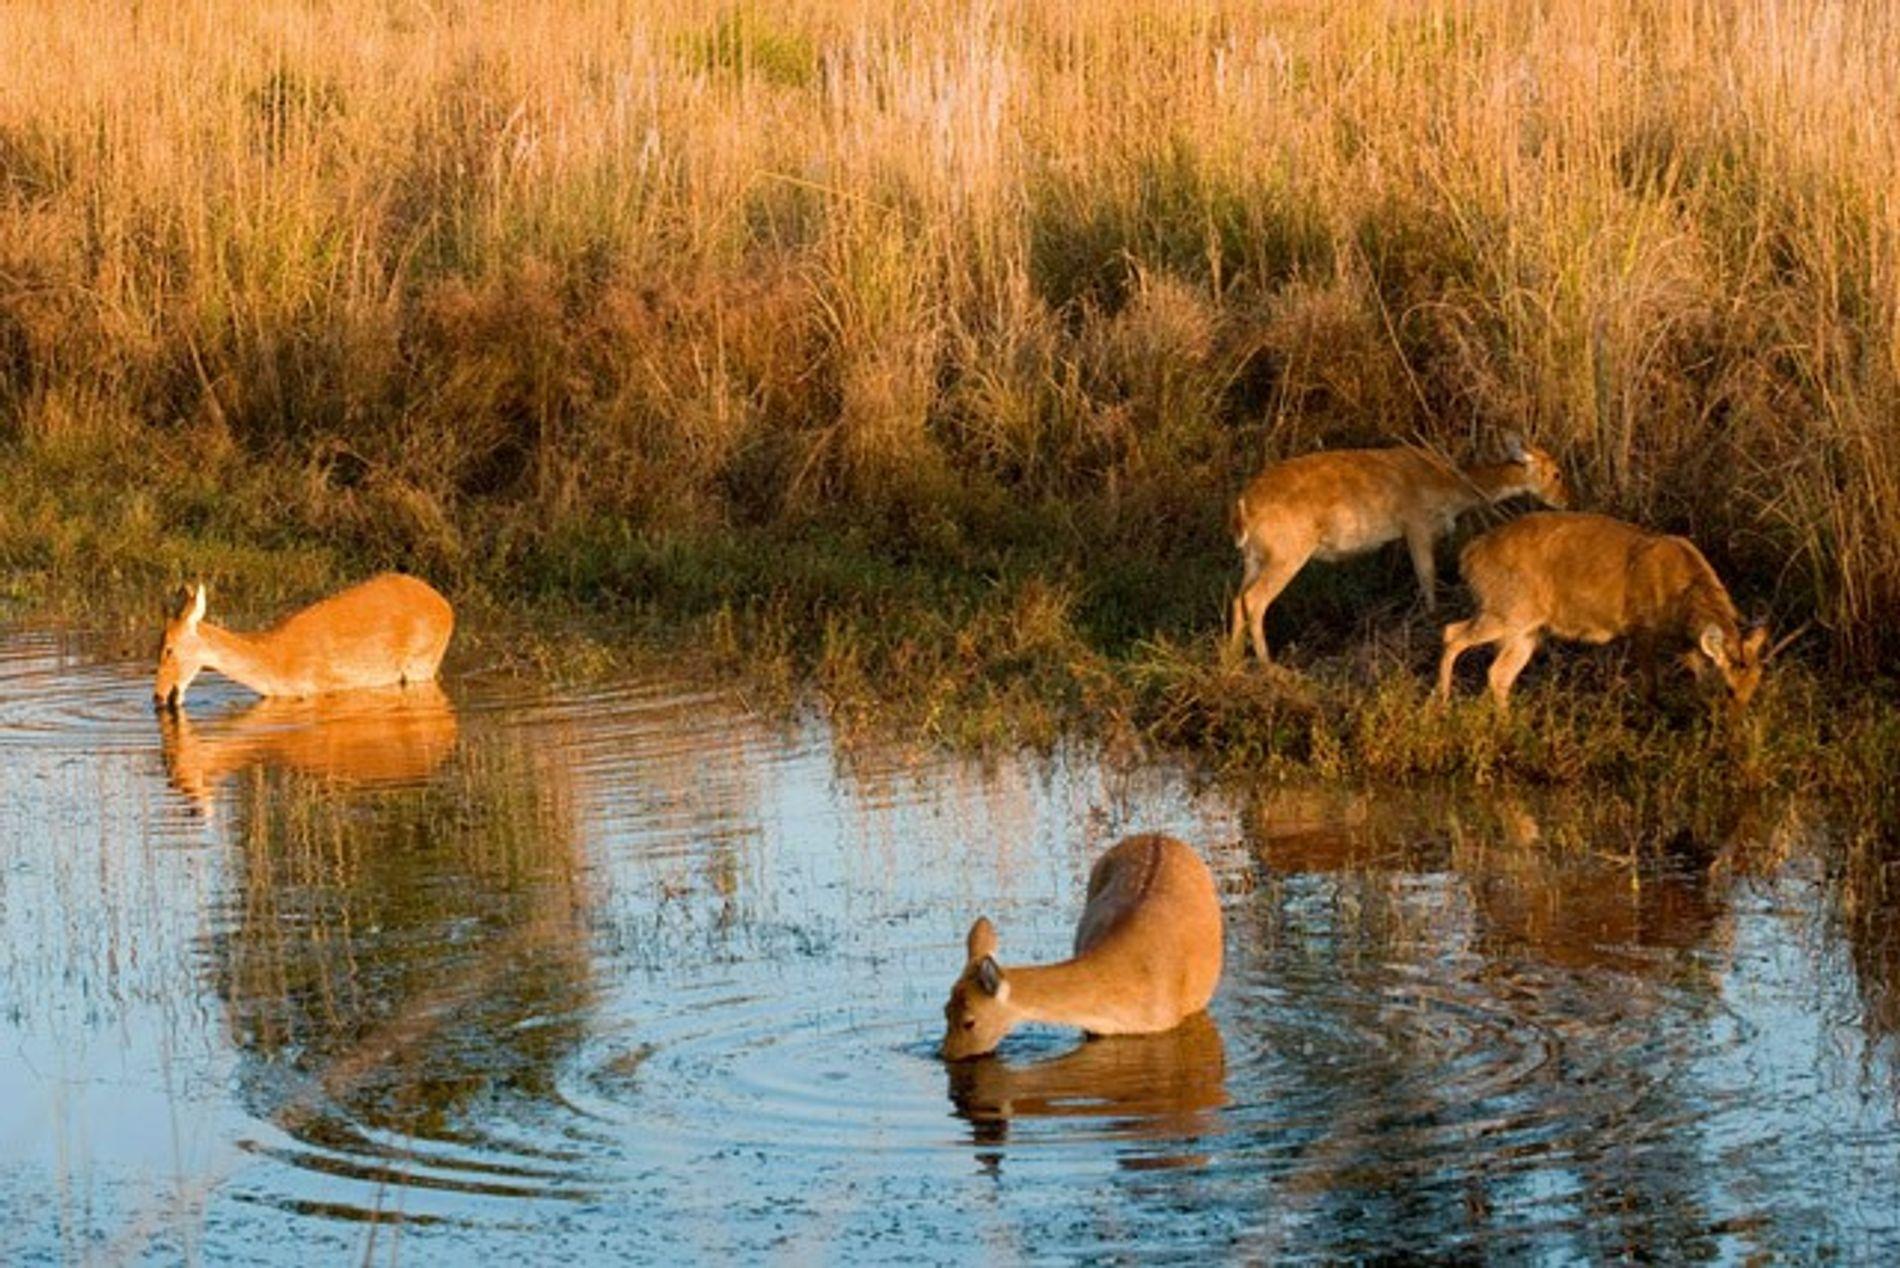 India: Meeting Kanha's barasingha deer